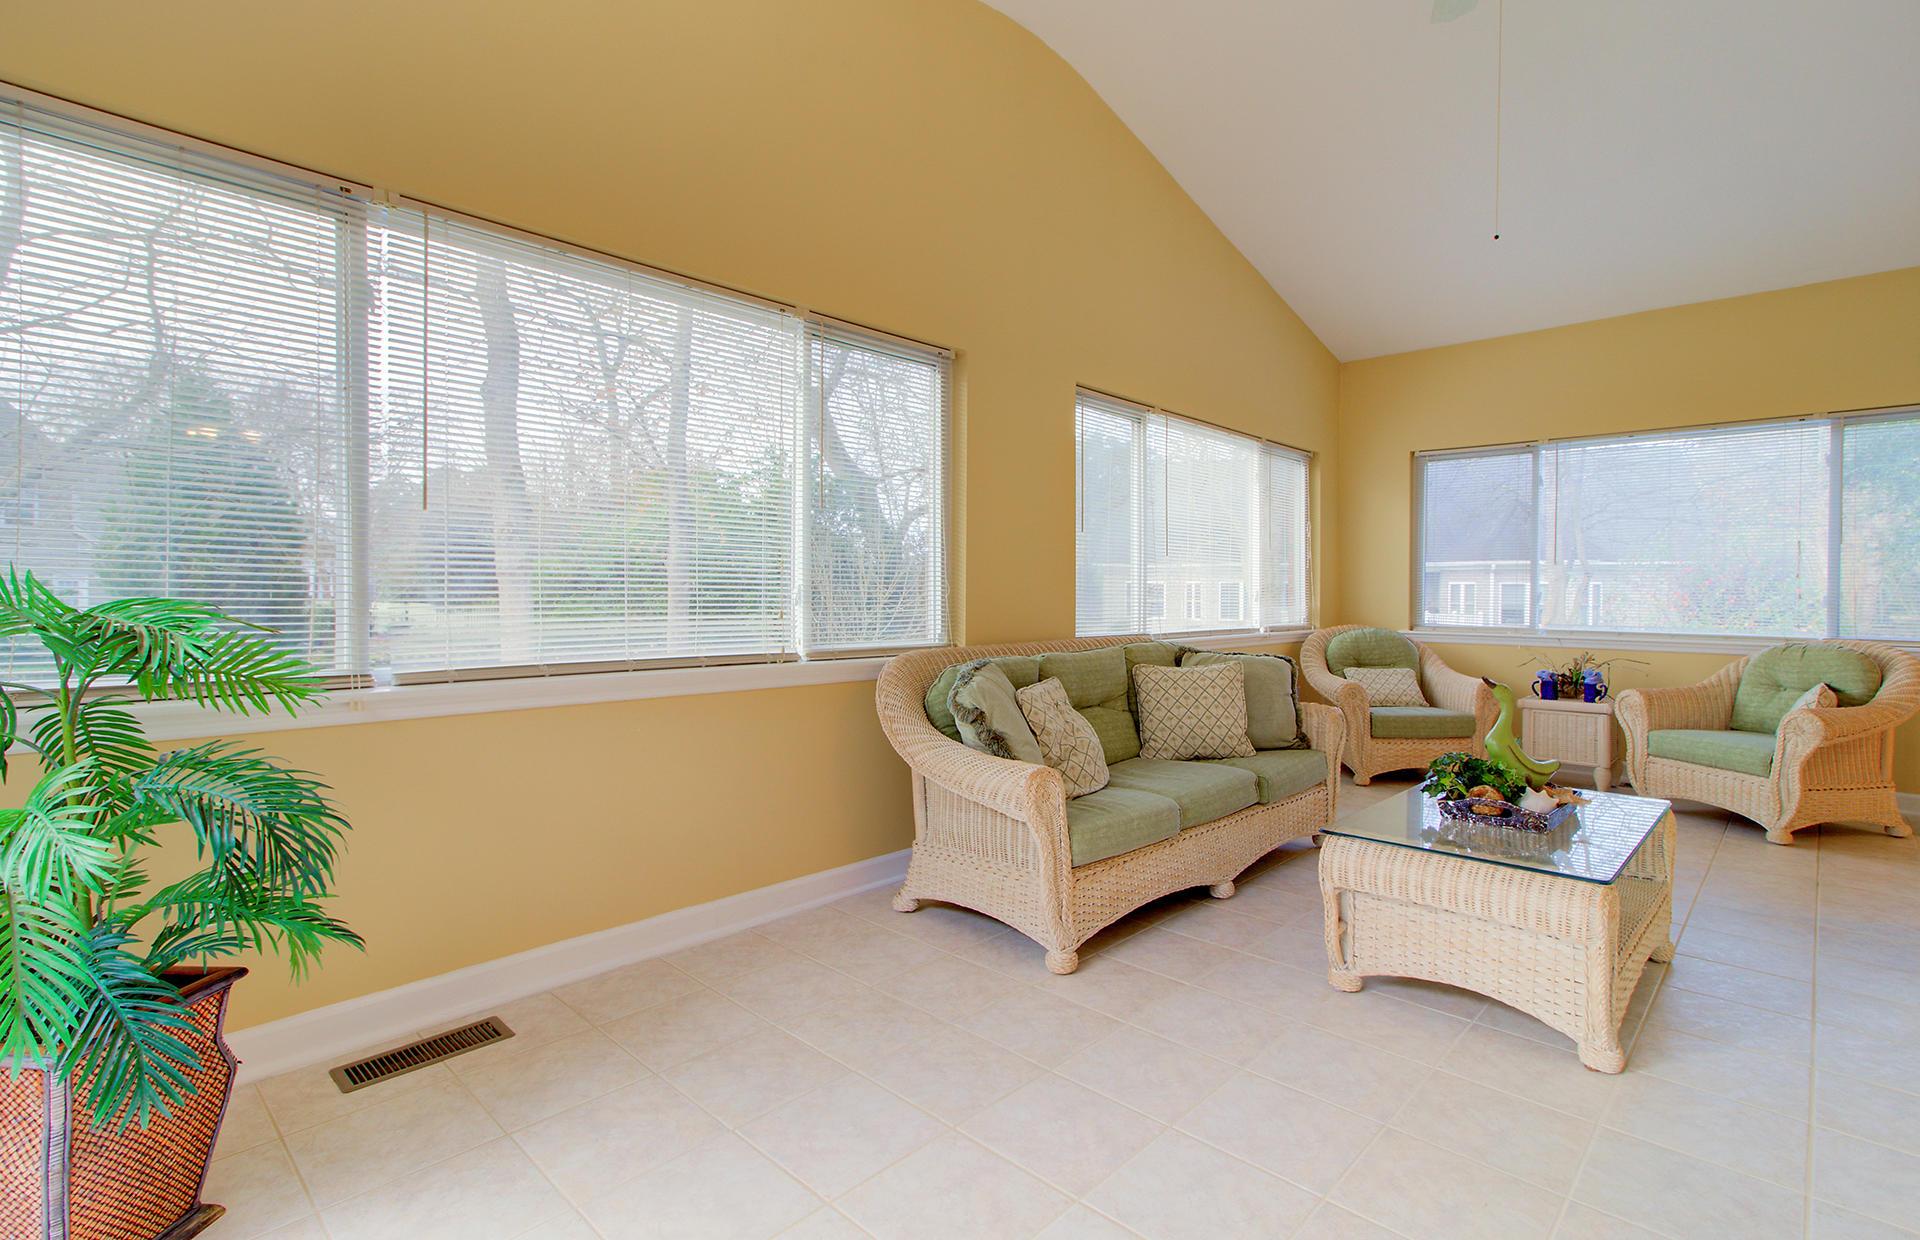 Bakers Landing Homes For Sale - 105 River Oak, North Charleston, SC - 16